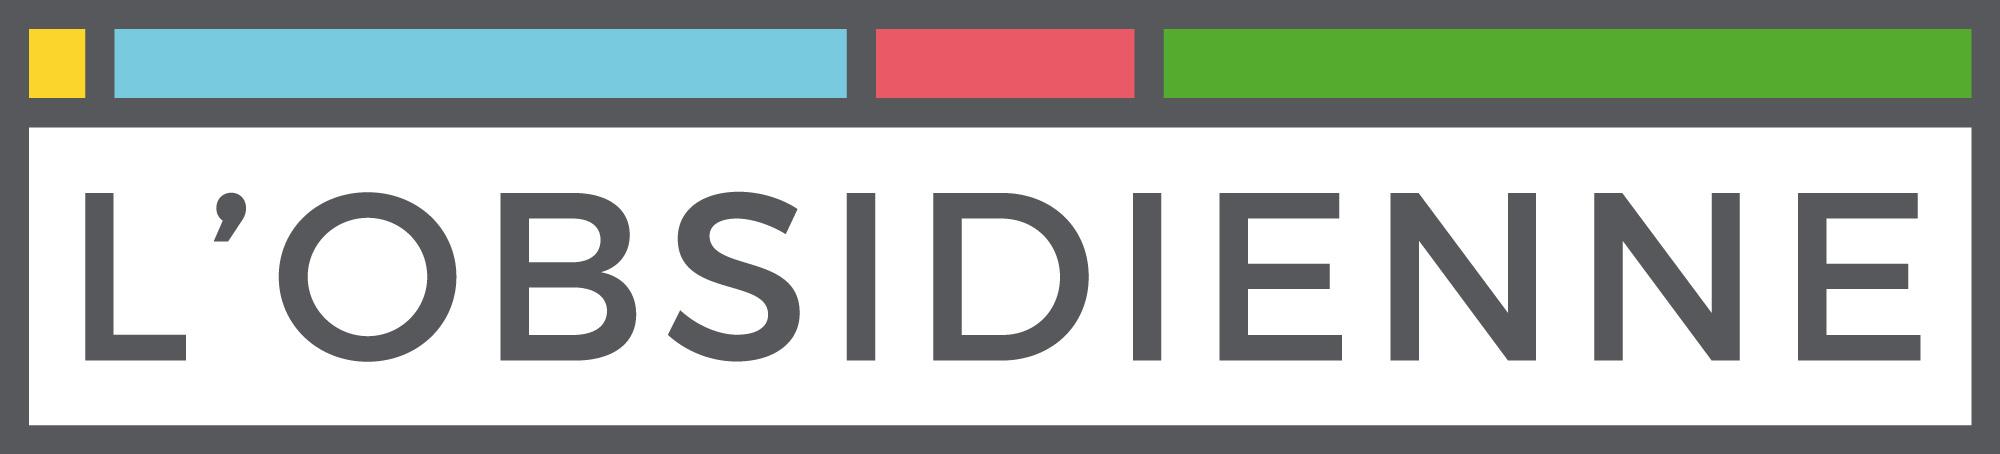 logo L'Obsidienne